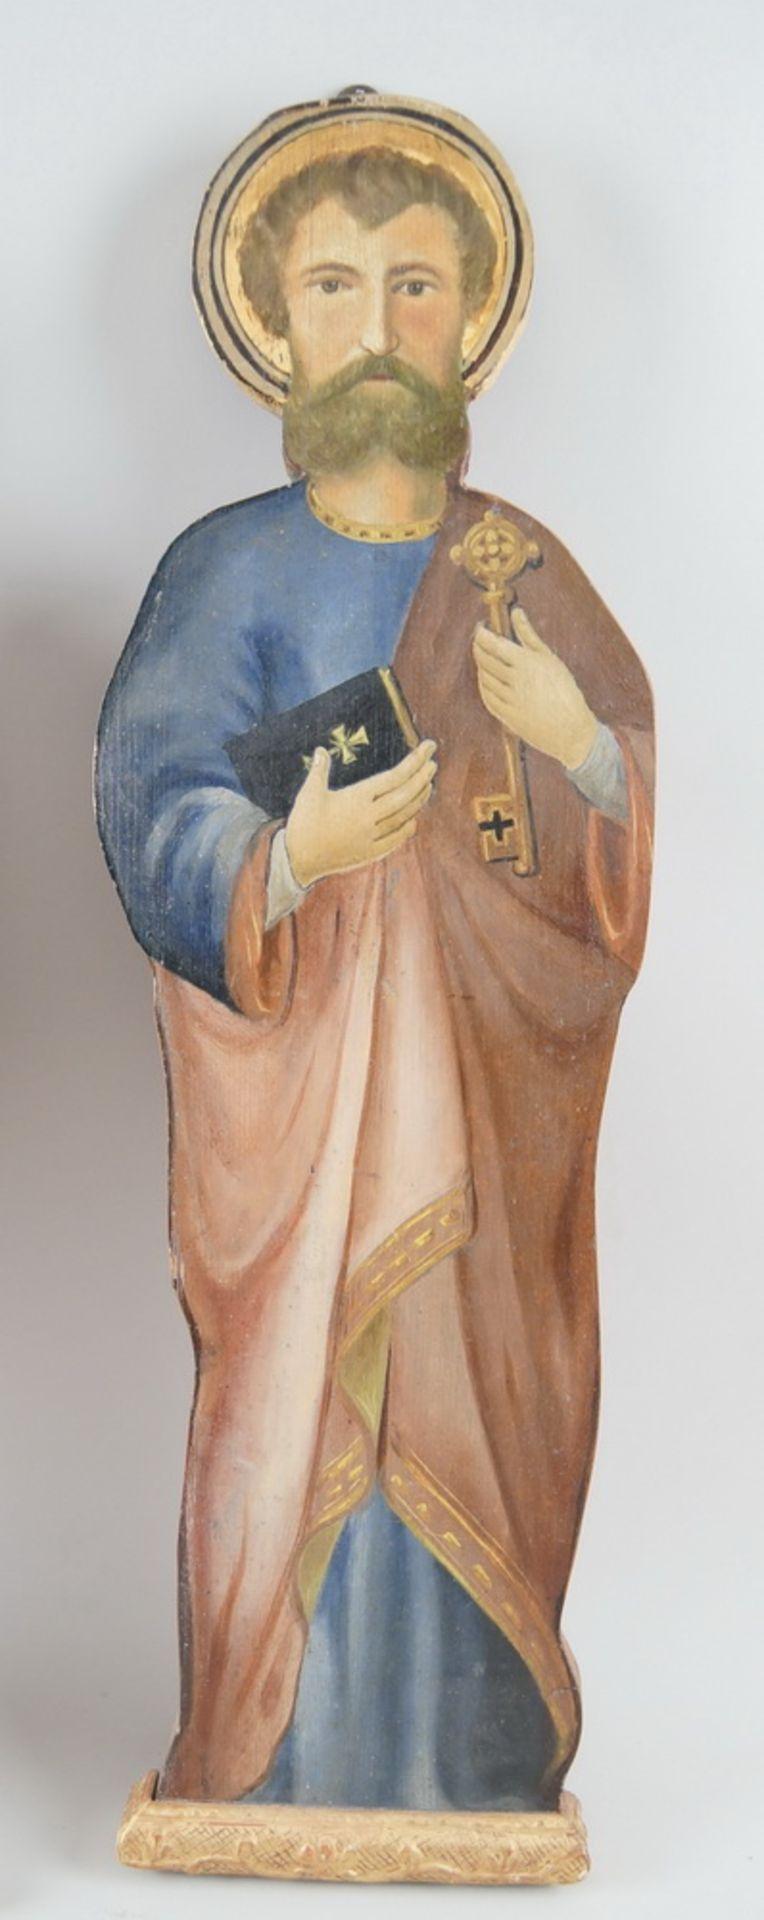 Los 14 - Peter und Paul, heiliger Petrus und Paulus, bemalte Holztafeln, 19. JH, geschnitzt, H 68cm